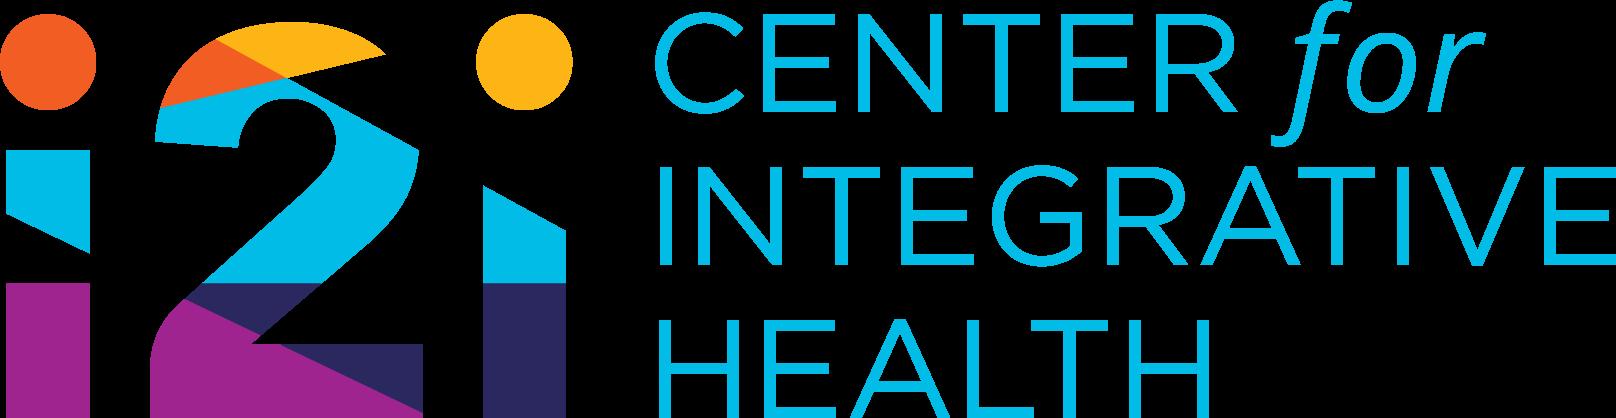 i2i Center Logo